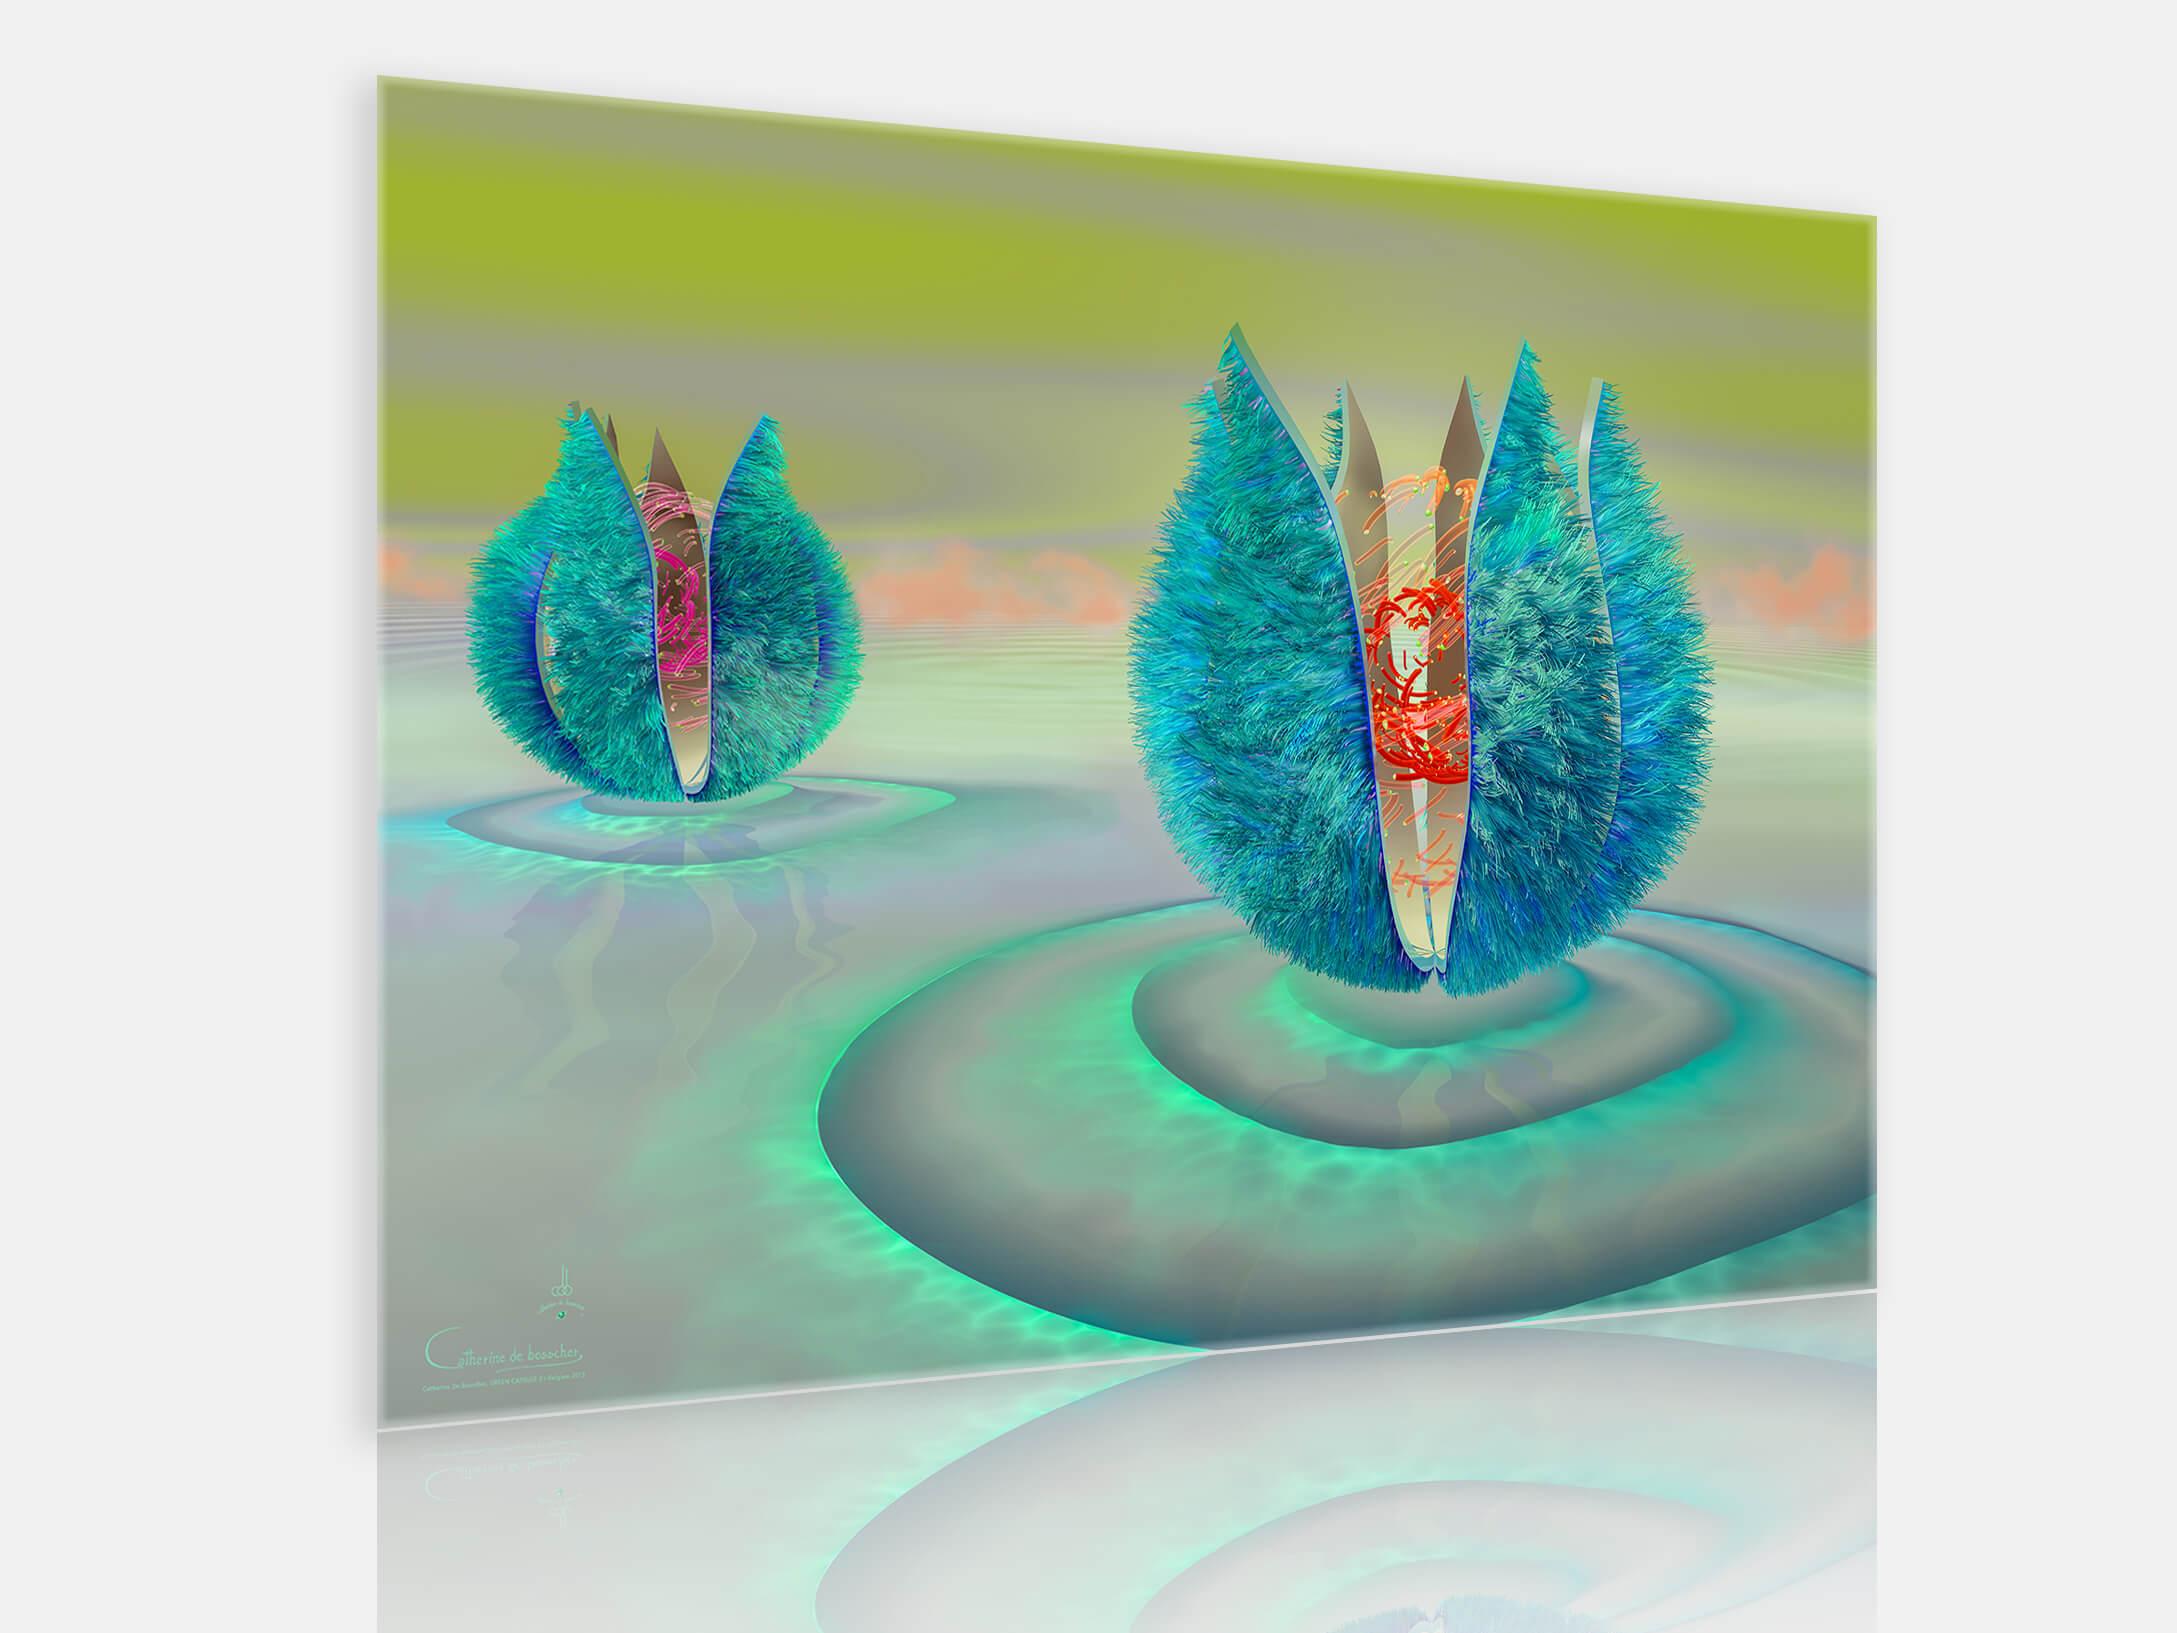 """Green Capsule 2"" 140 x 100 cm or 112 x 80 cm by Catherine De Bosscher"